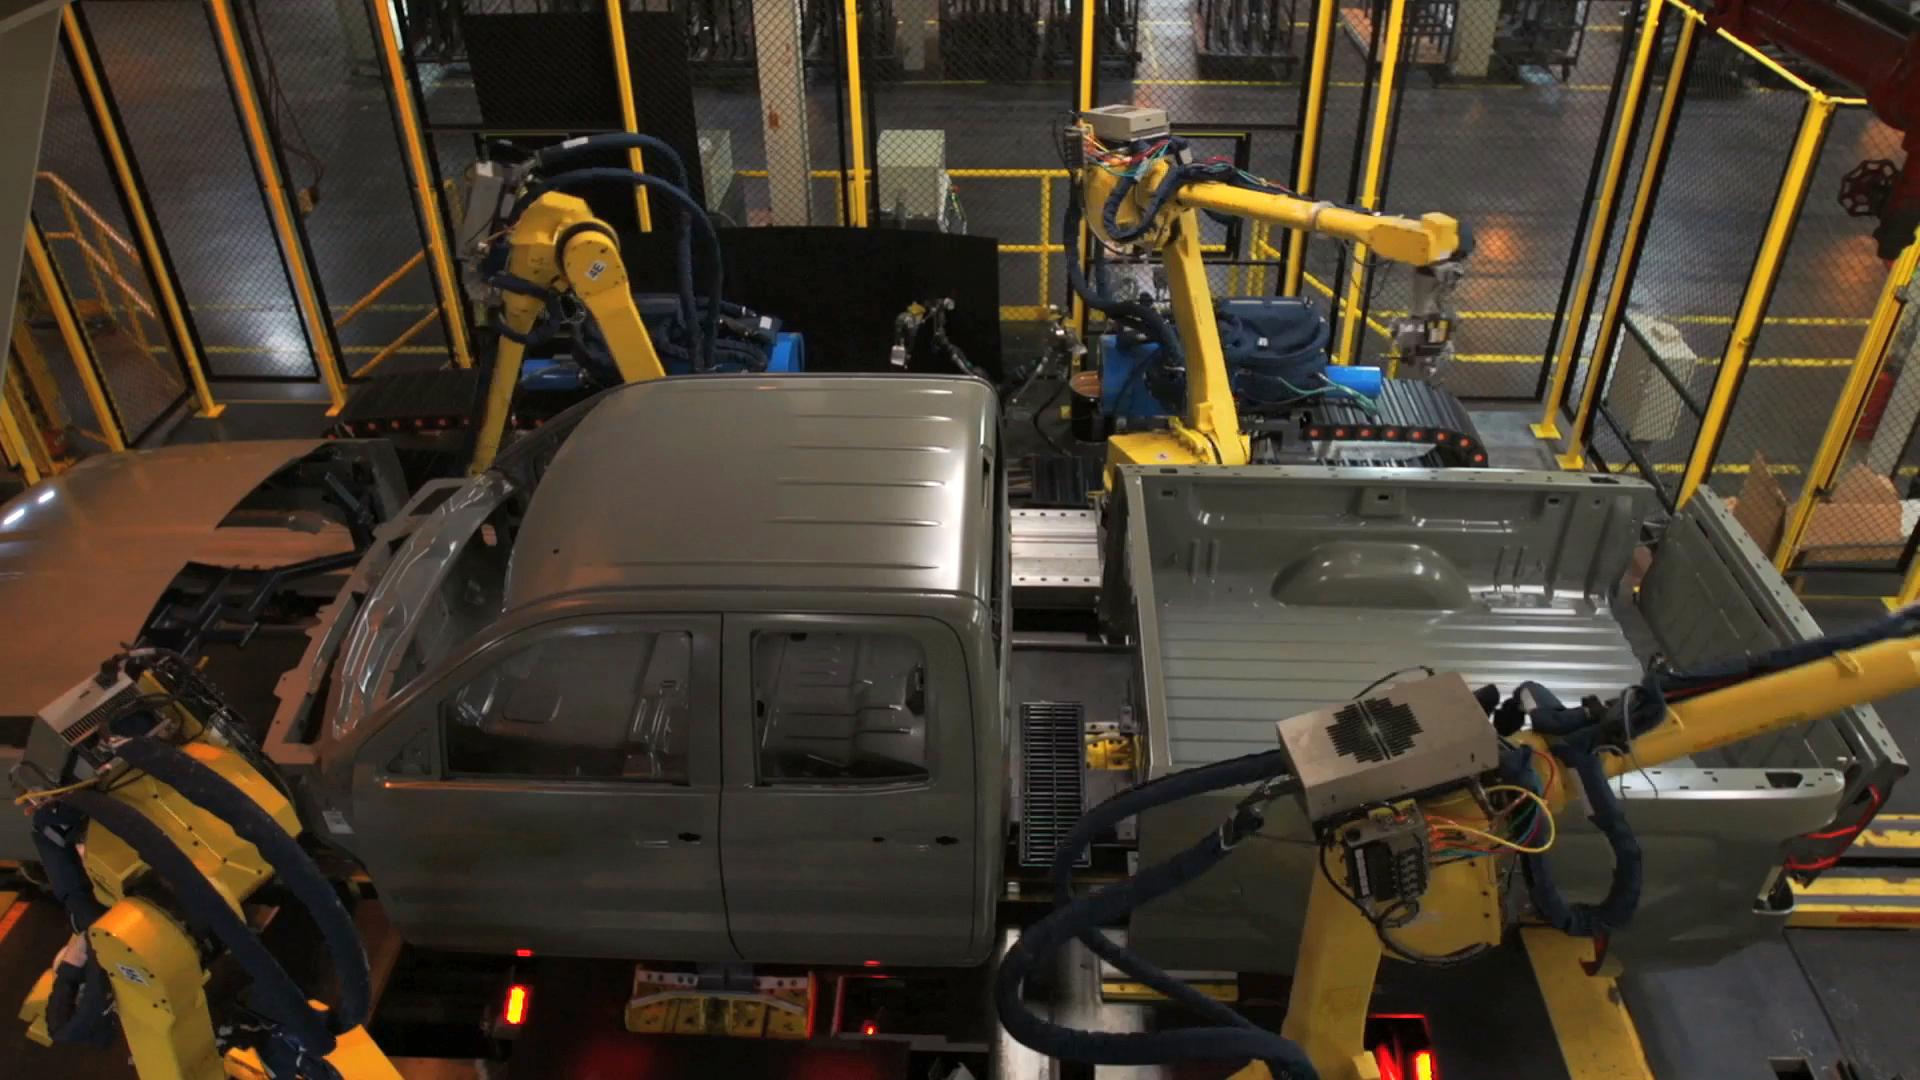 2014 Silverado Is Most Corrosion-Resistant Chevrolet Truck